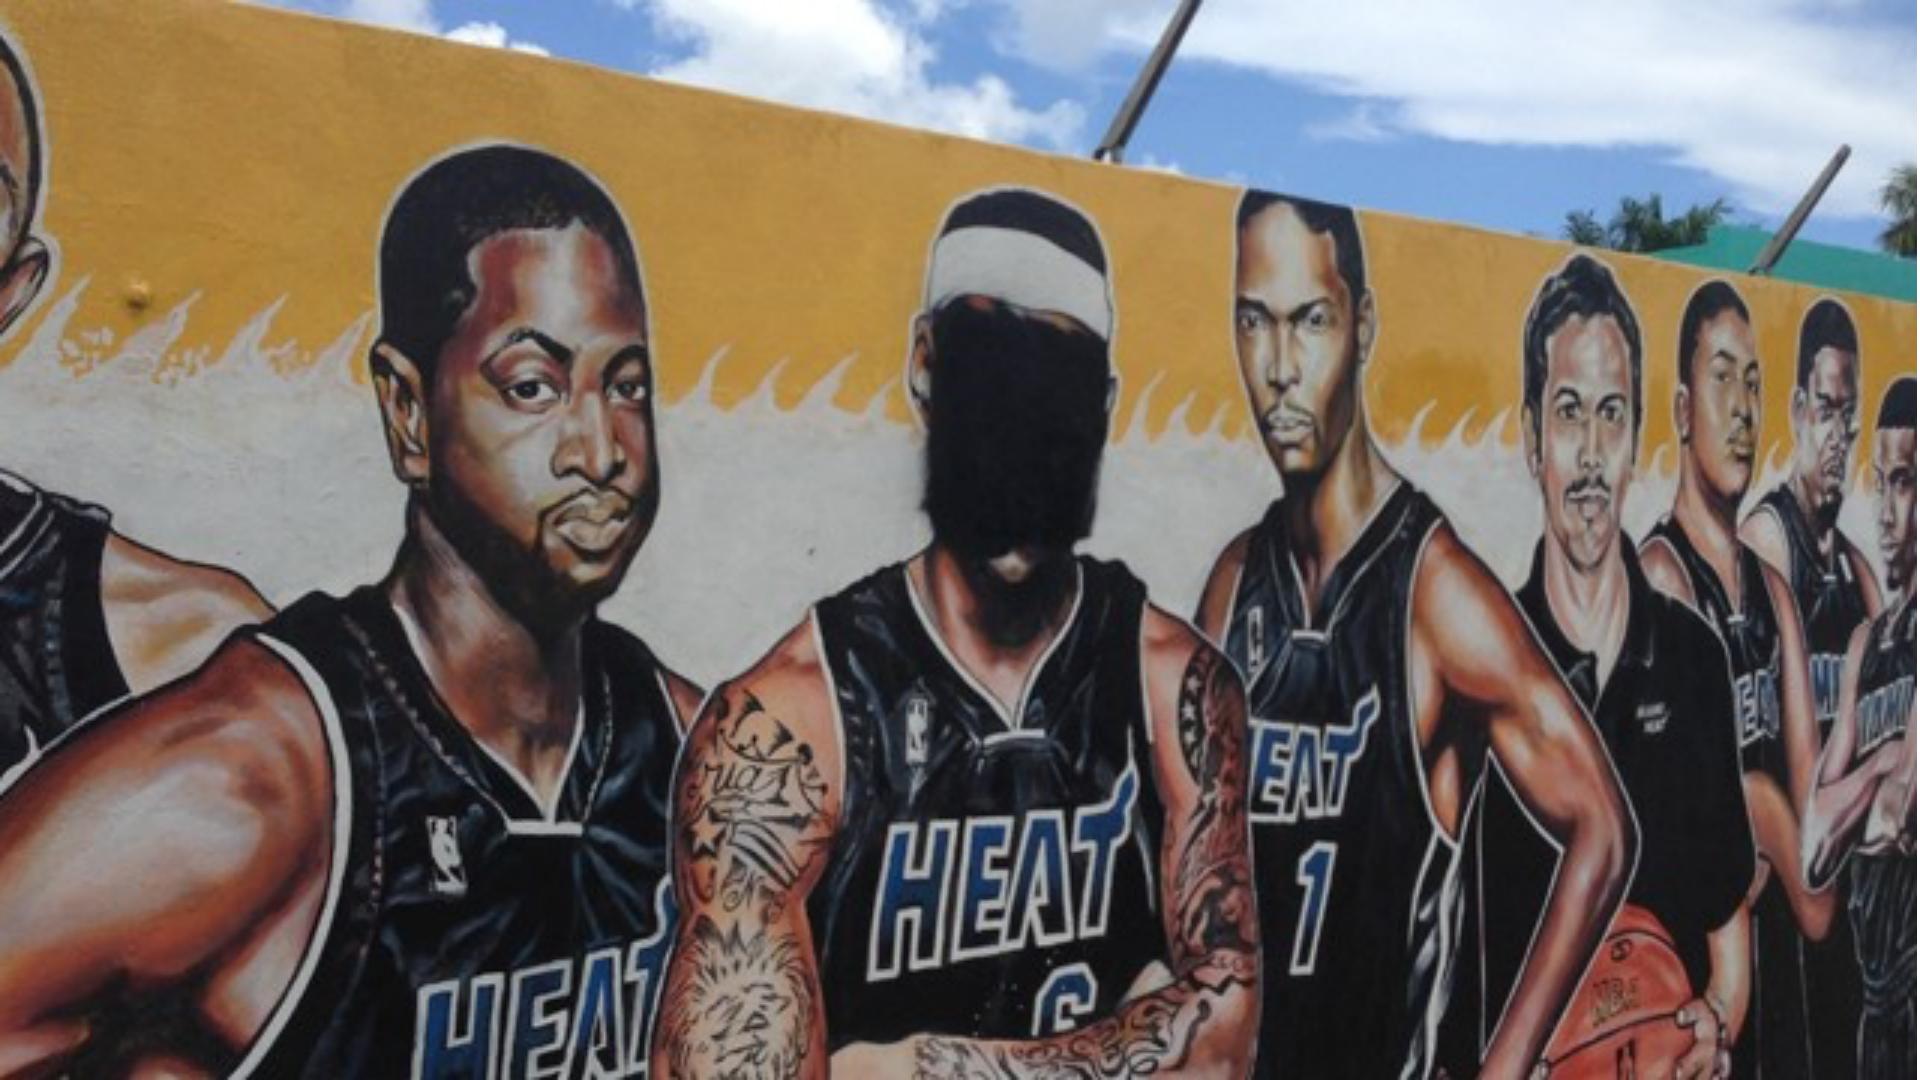 heat-mural-ftr-7112014-abc